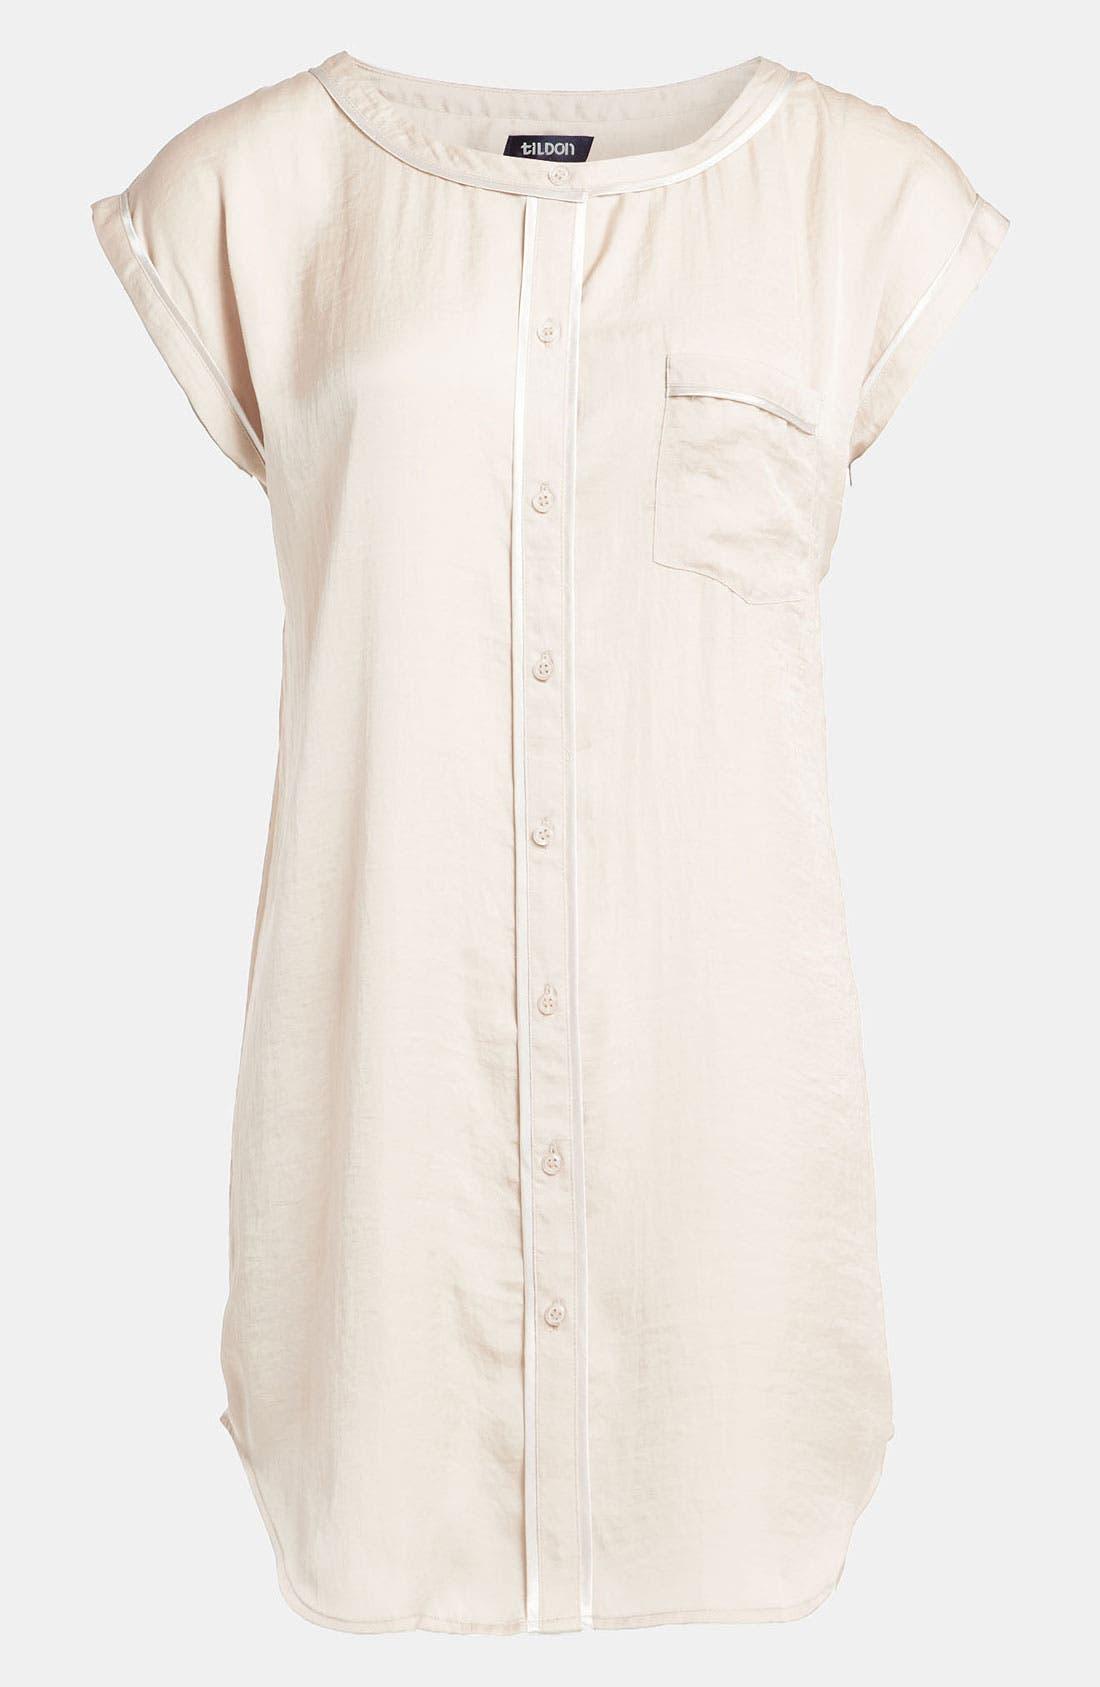 Main Image - Tildon 'Pajama' Tunic Top